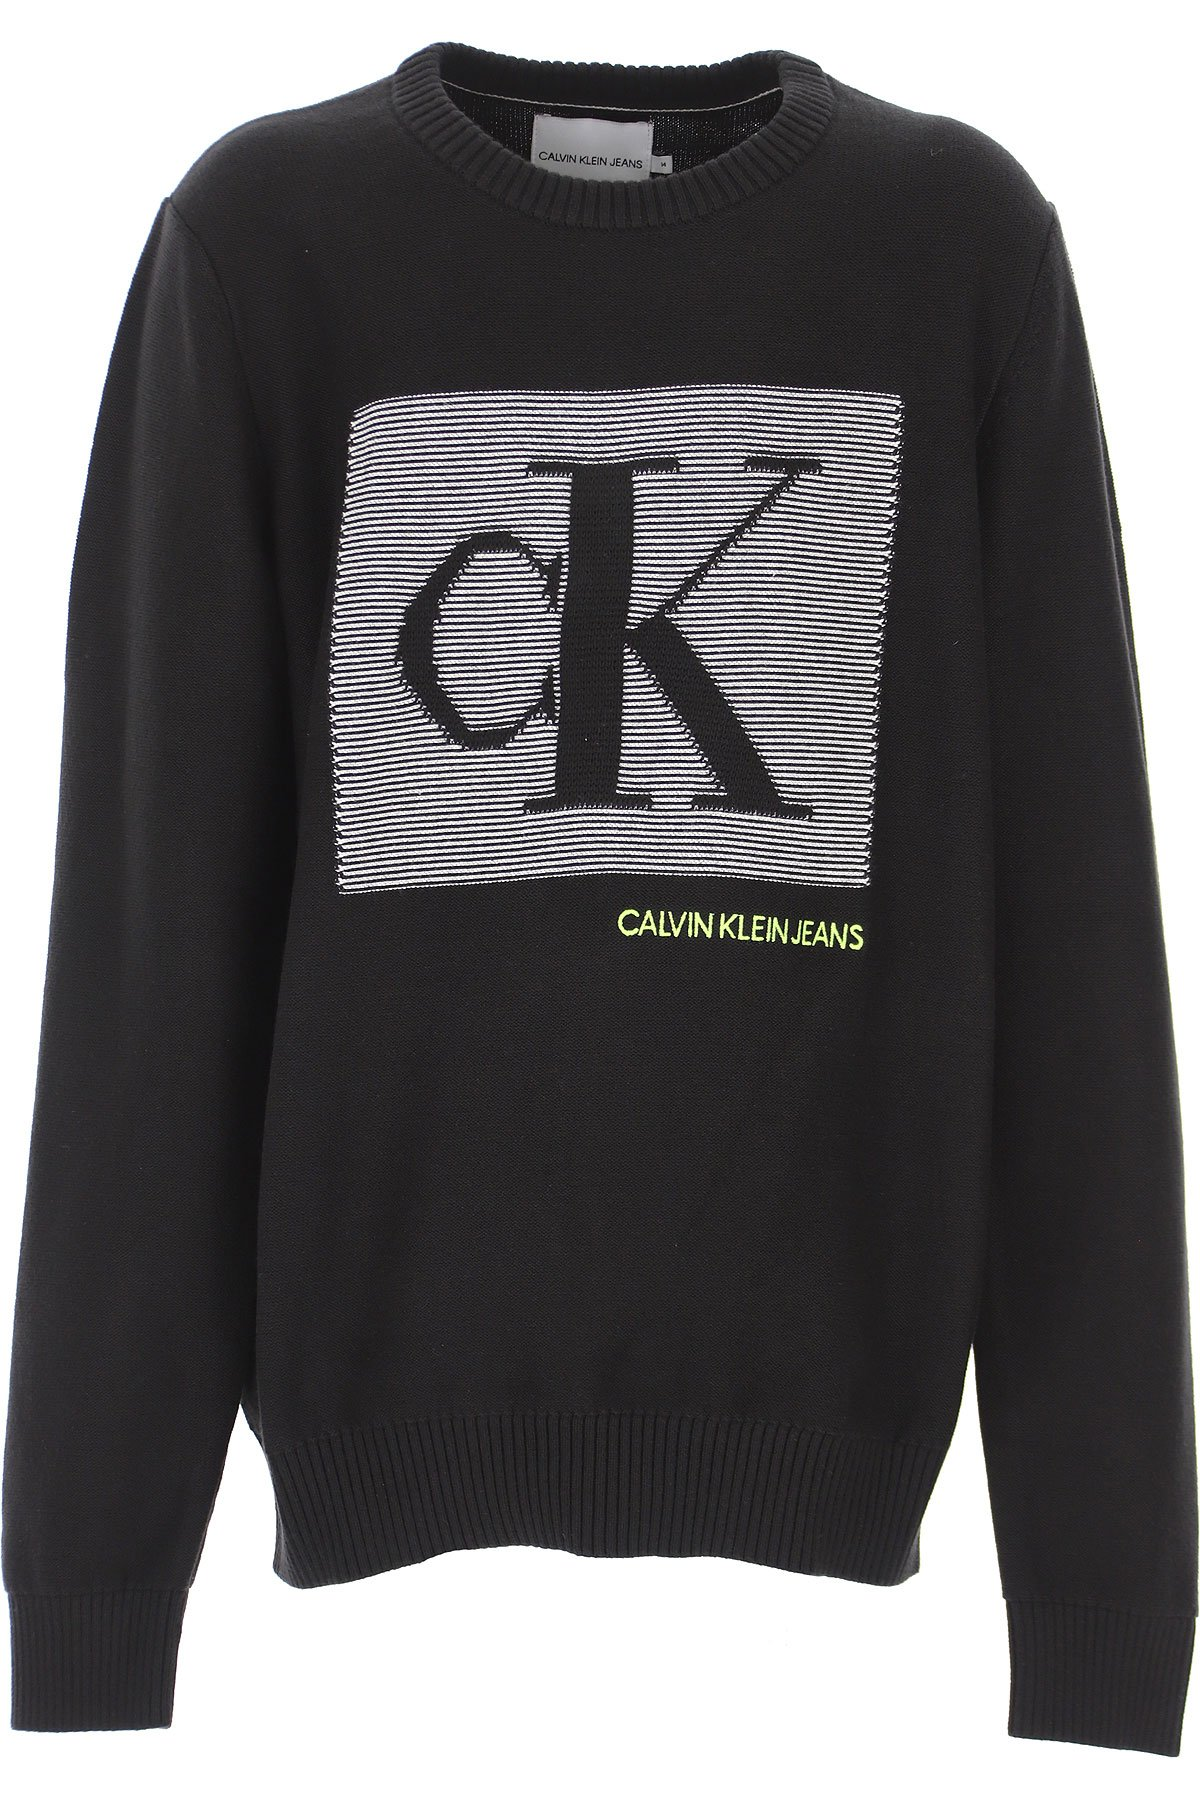 Calvin Klein, Monogram contrast sweater, luomupuuvillaneule